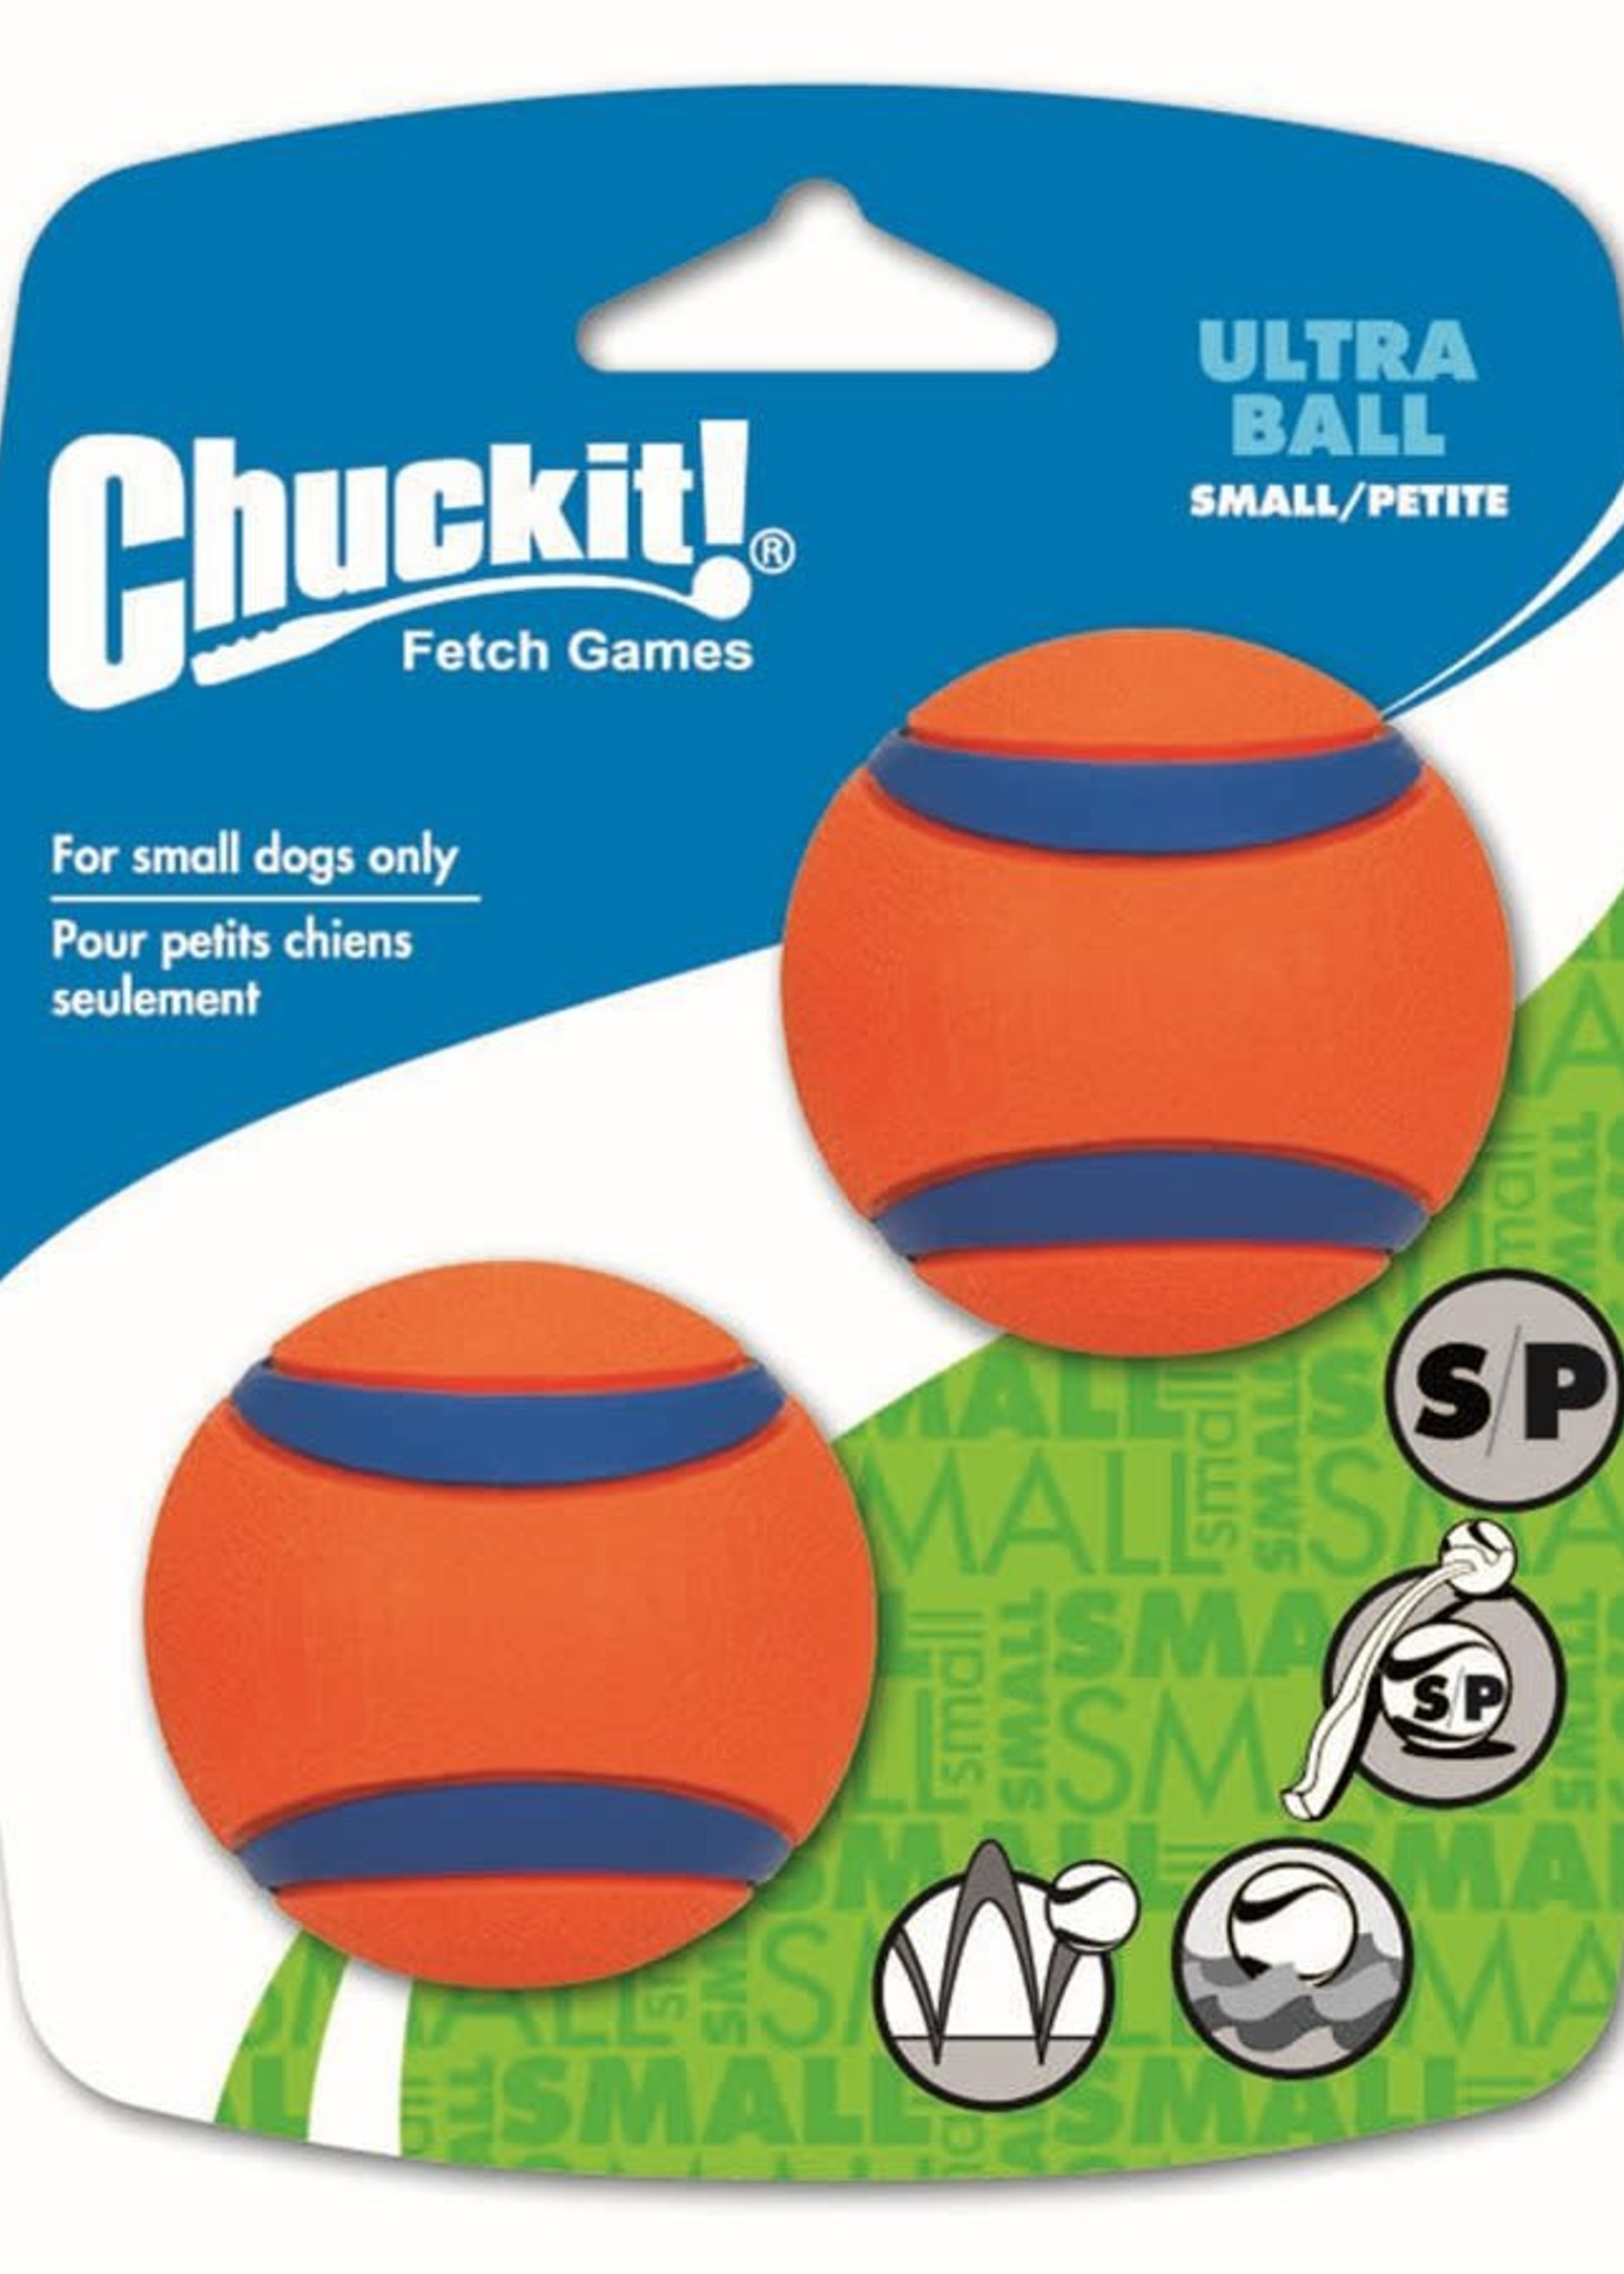 Chuckit!® CHUCK IT!  ULTRA BALL SM 2pk